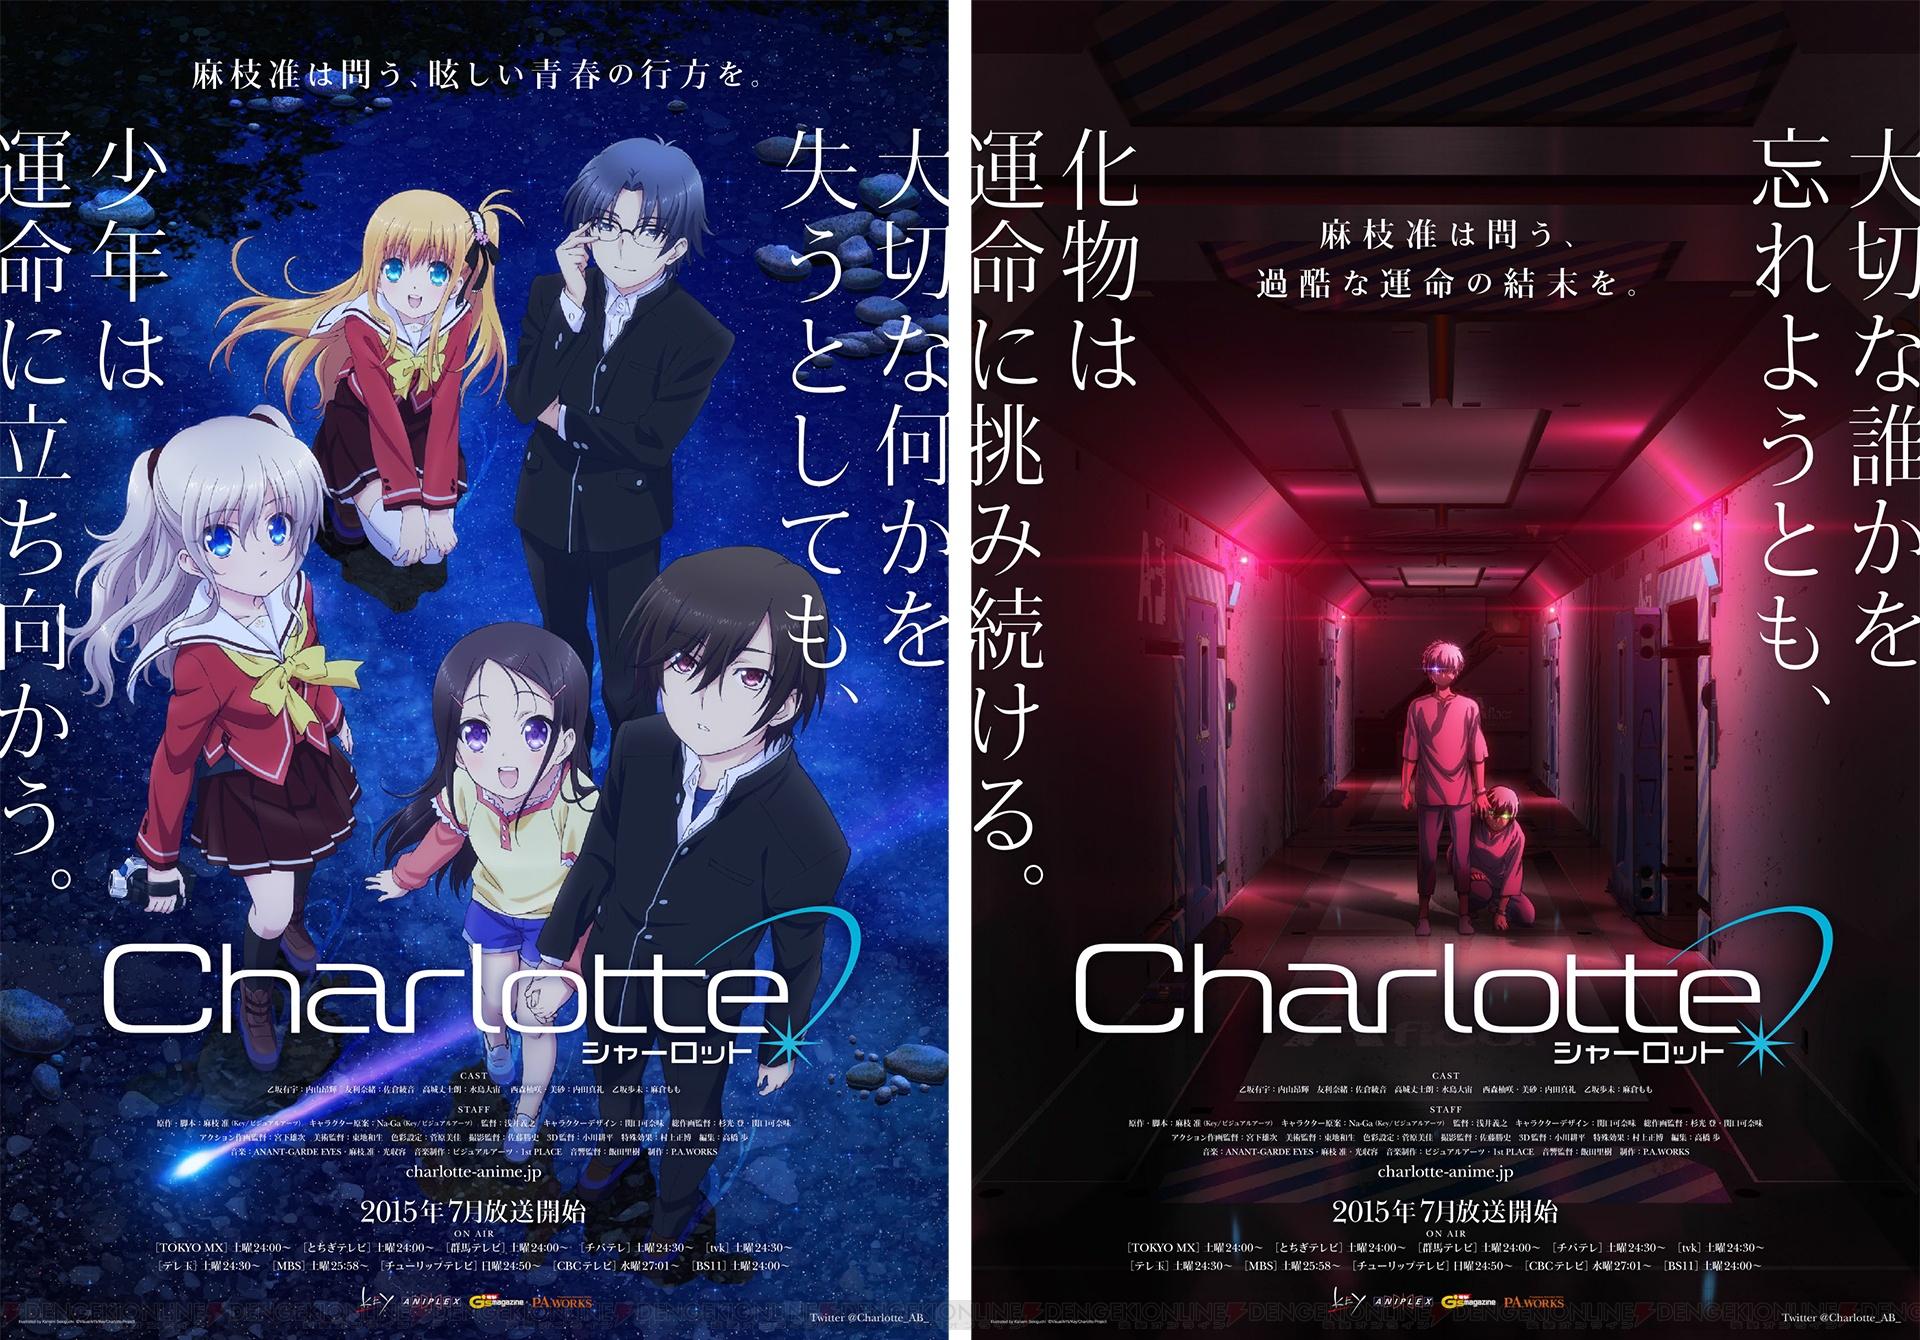 TVアニメ『Charlotte』全話サブタイトルを先行公開! 本日7月4日24時より放送開始